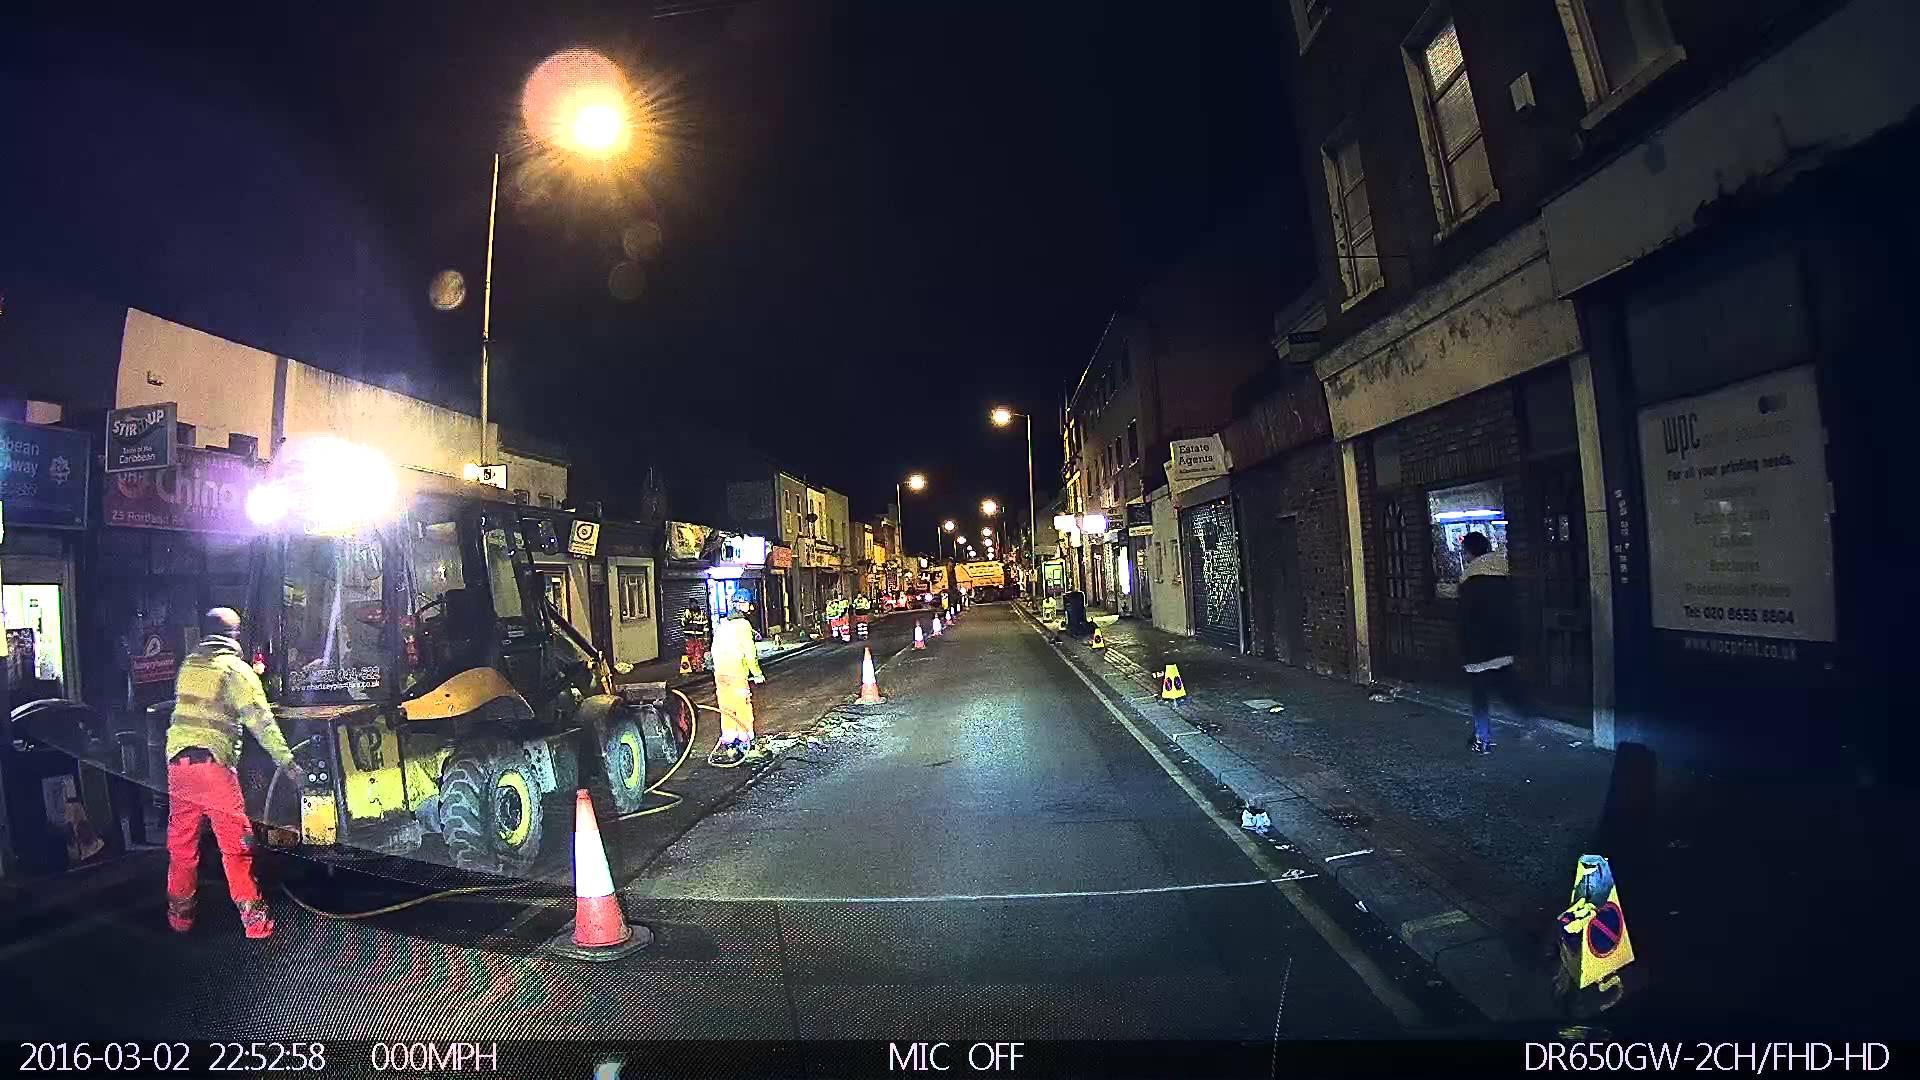 Drunk Pedestrian Walking into Moving Car